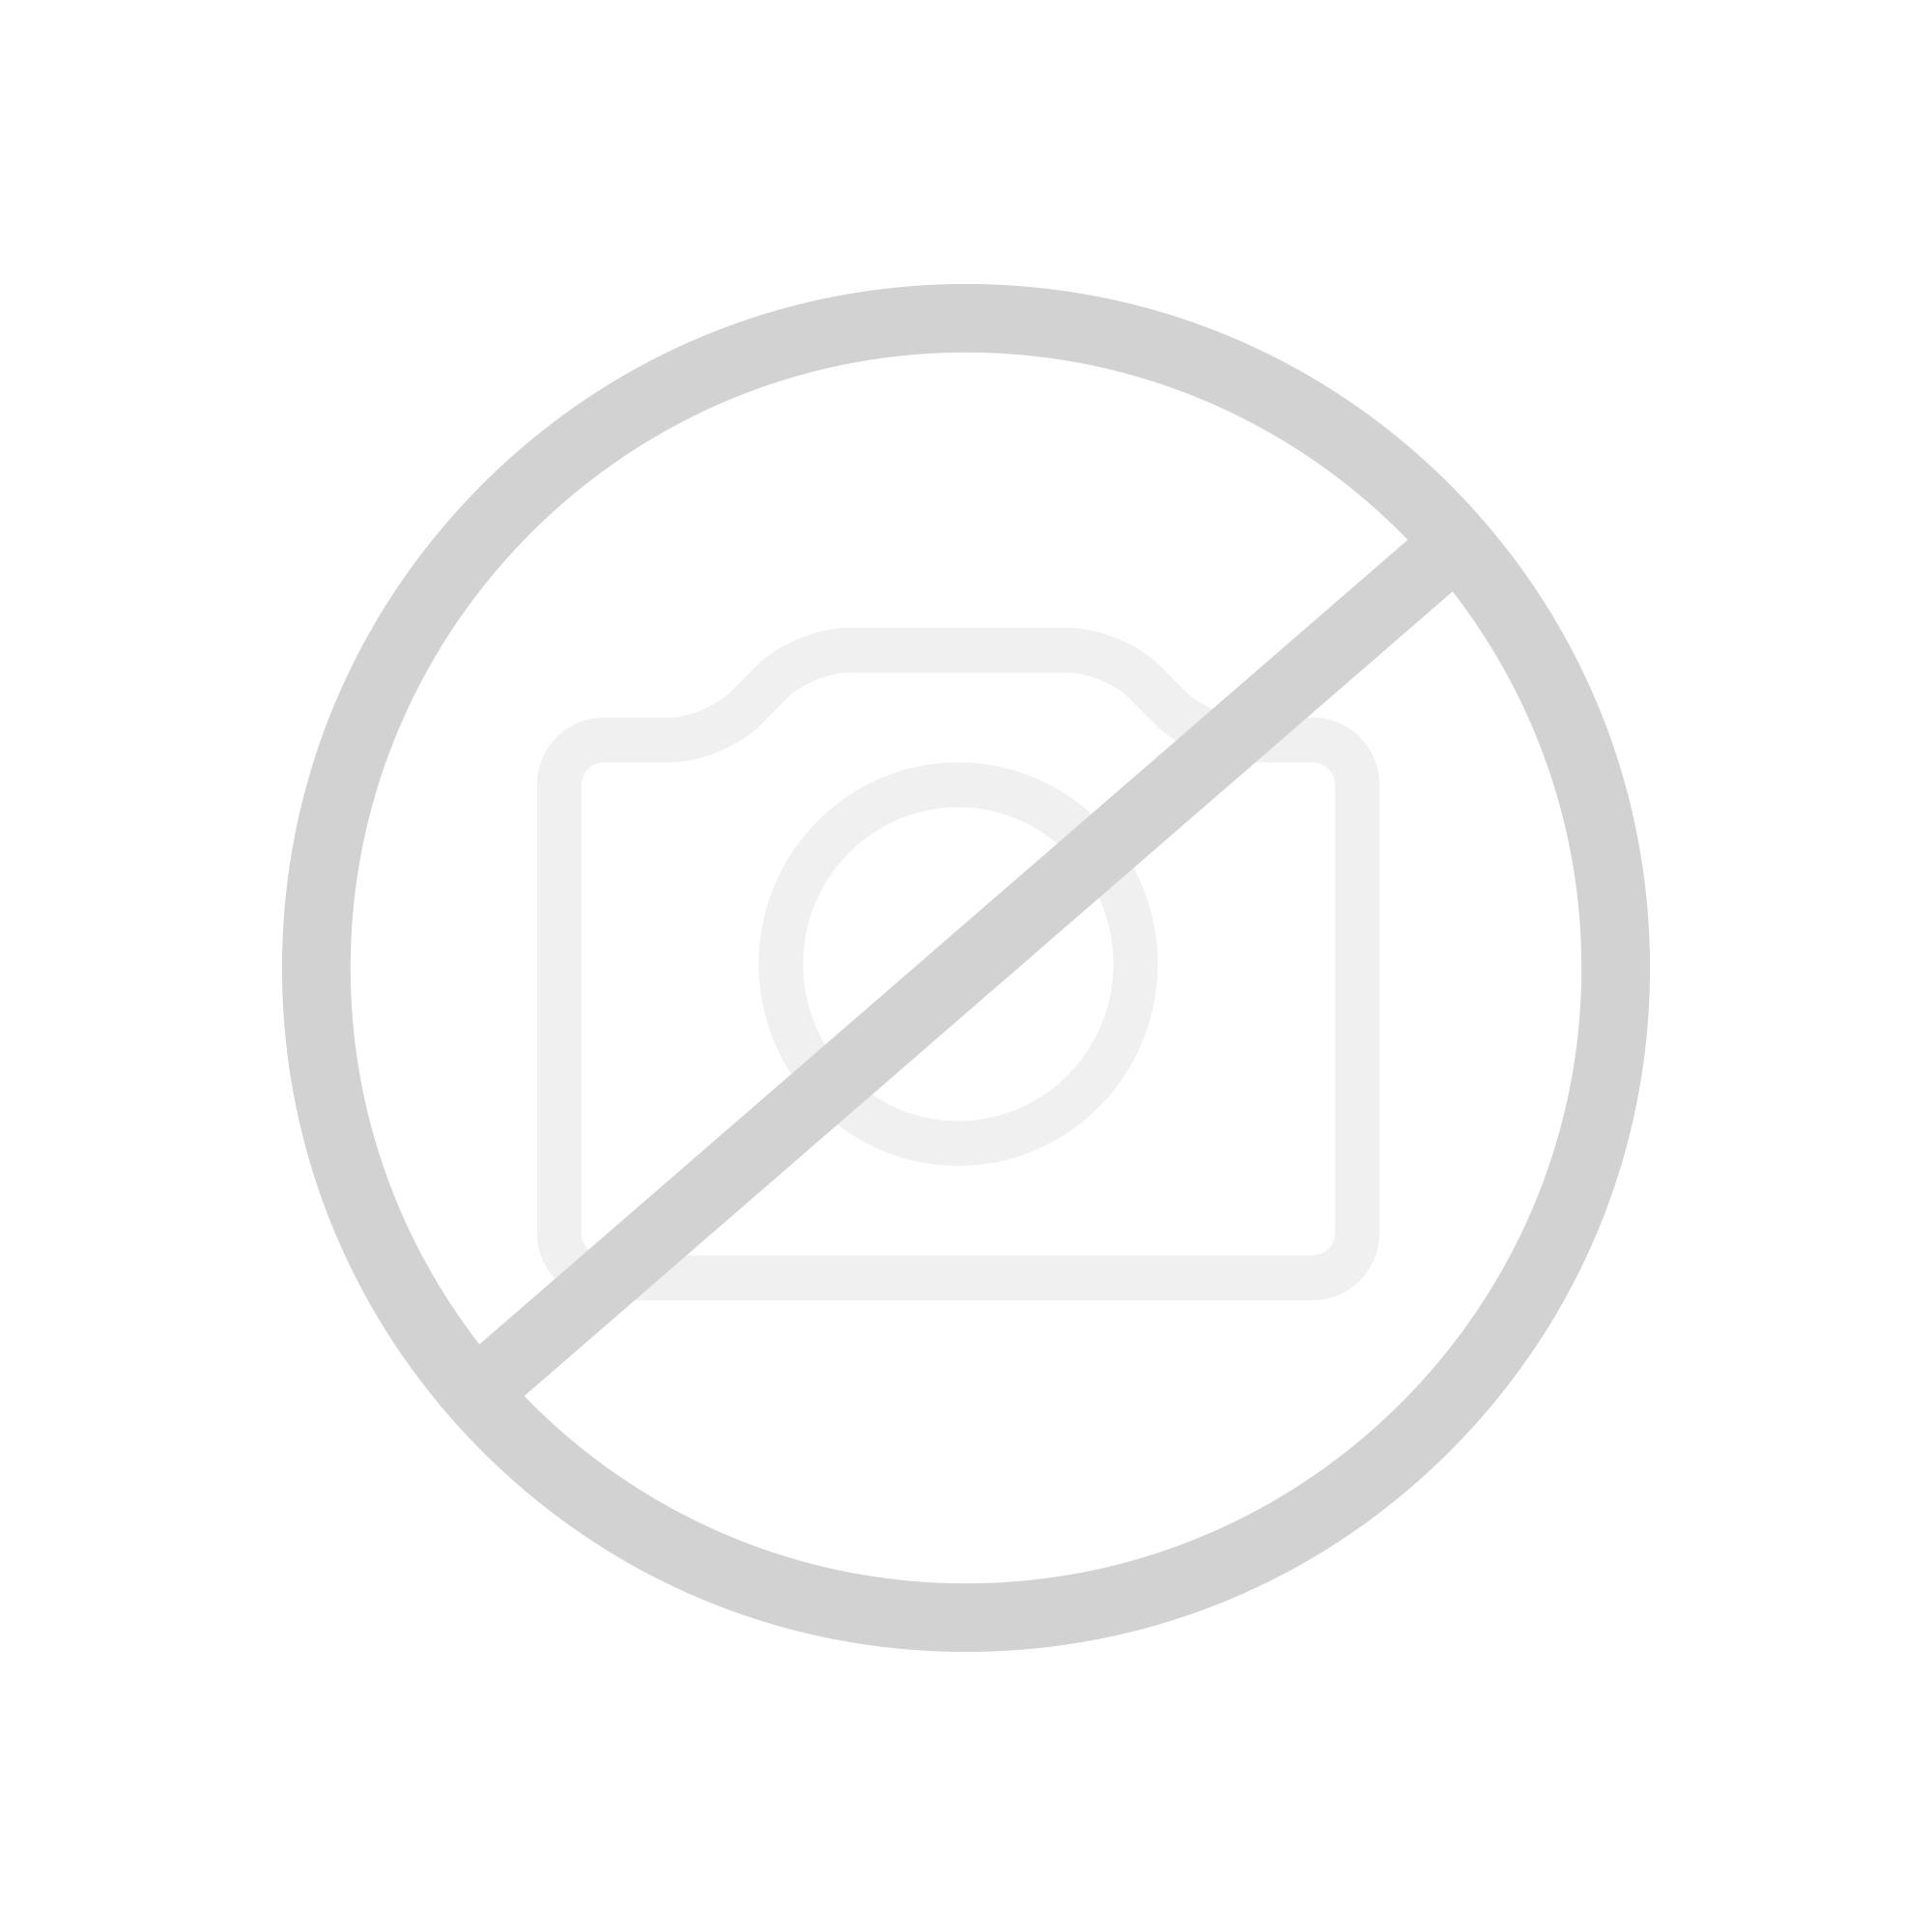 decor walther box wandleuchte chrom 0300900 reuter onlineshop. Black Bedroom Furniture Sets. Home Design Ideas